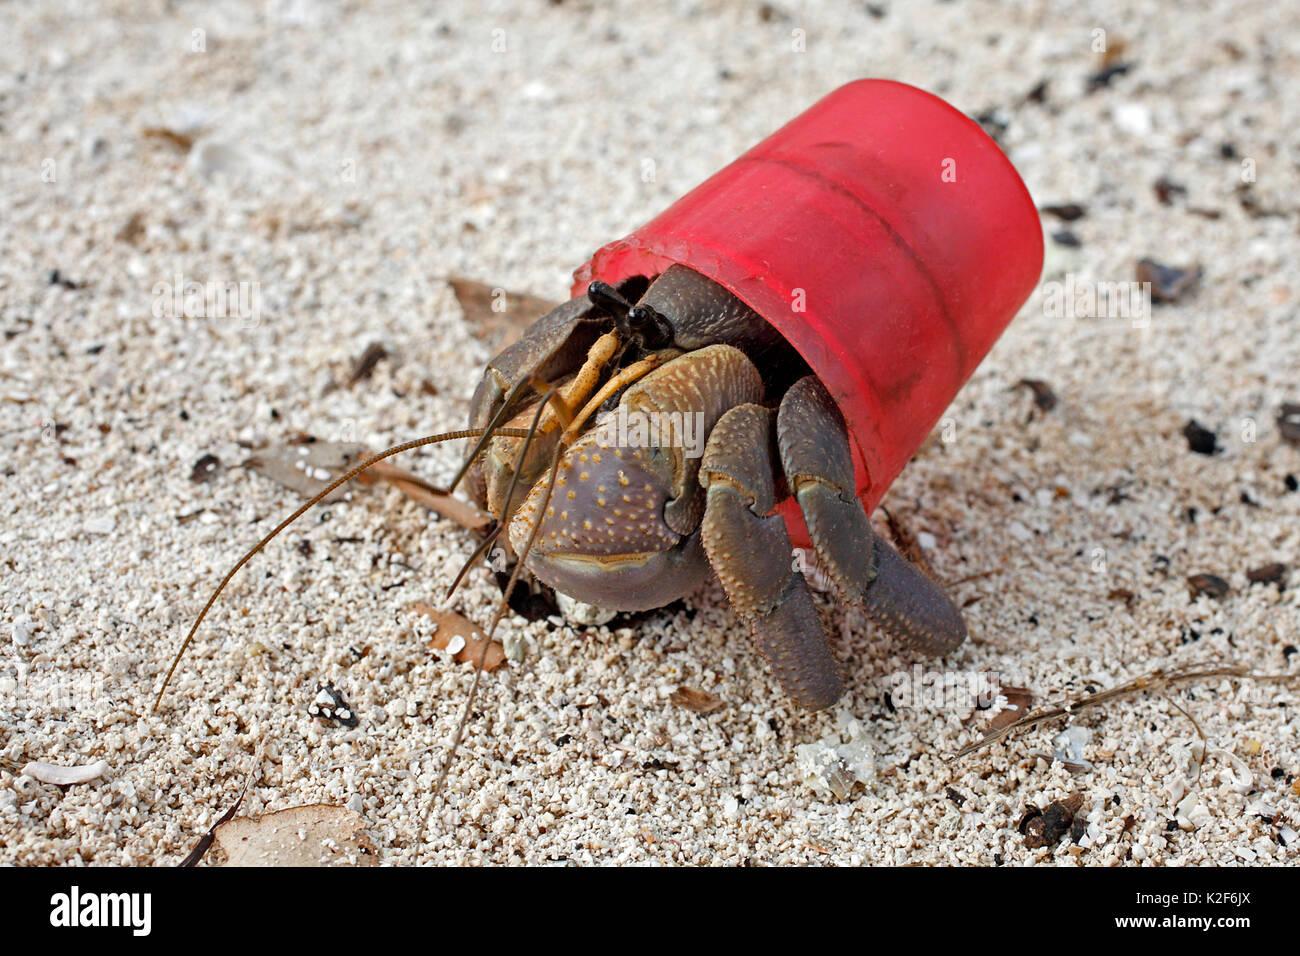 terrestrial-hermit-crab-coenobita-brevimanus-using-a-red-bottle-cap-K2F6JX.jpg